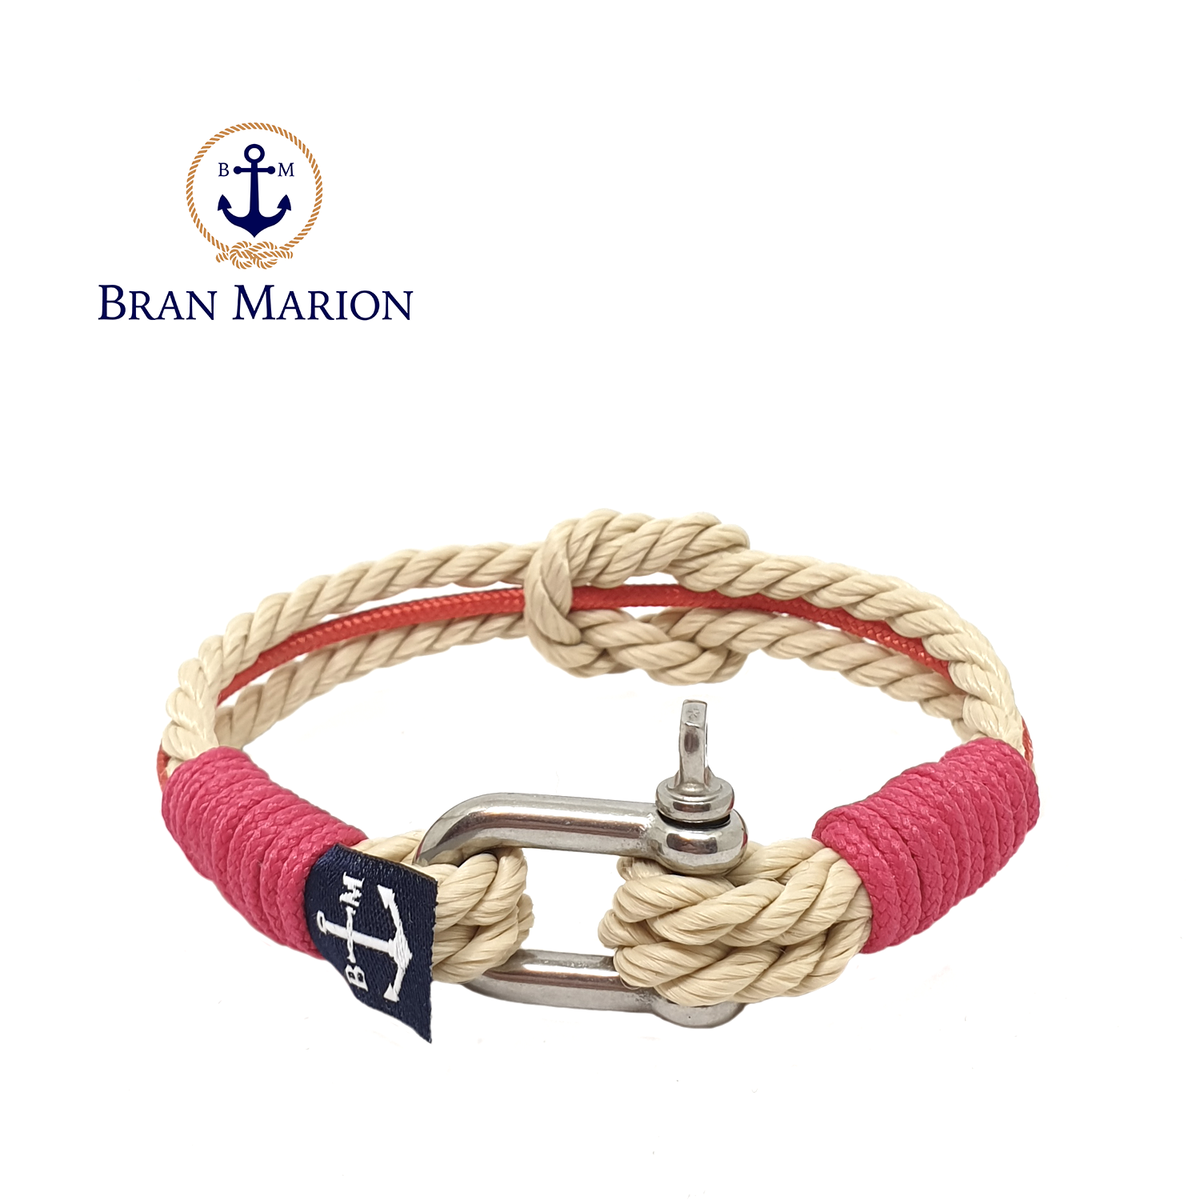 089e1c3062fc Pulsera náutica Burren de Bran Marion